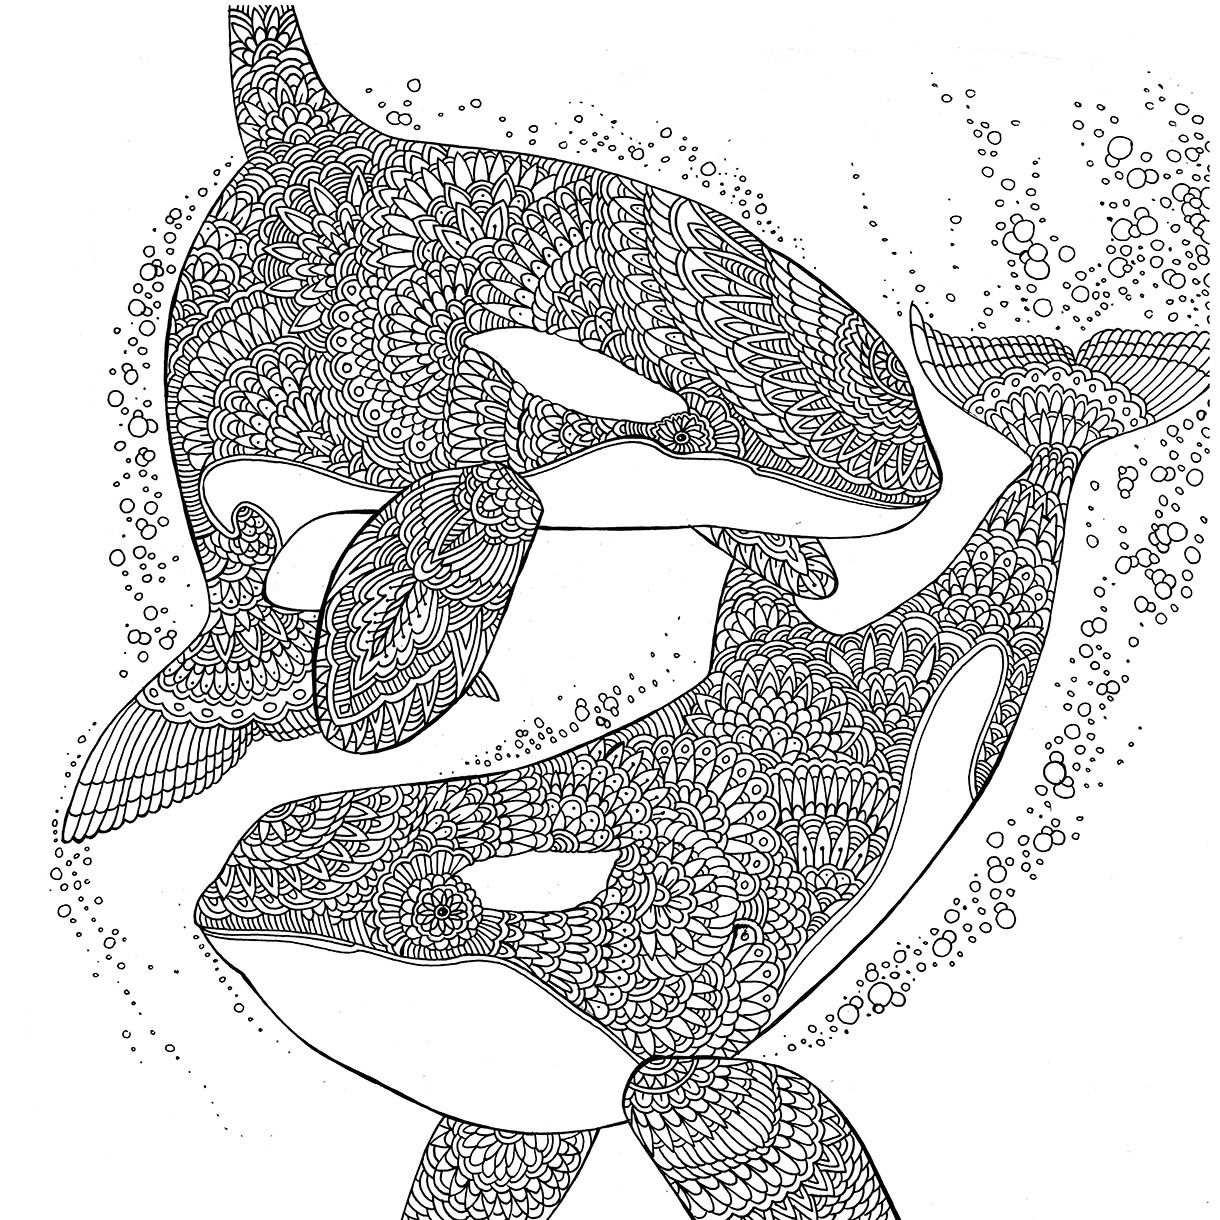 Orcas The Aquarium Colouring Book Richard Merritt Orcas